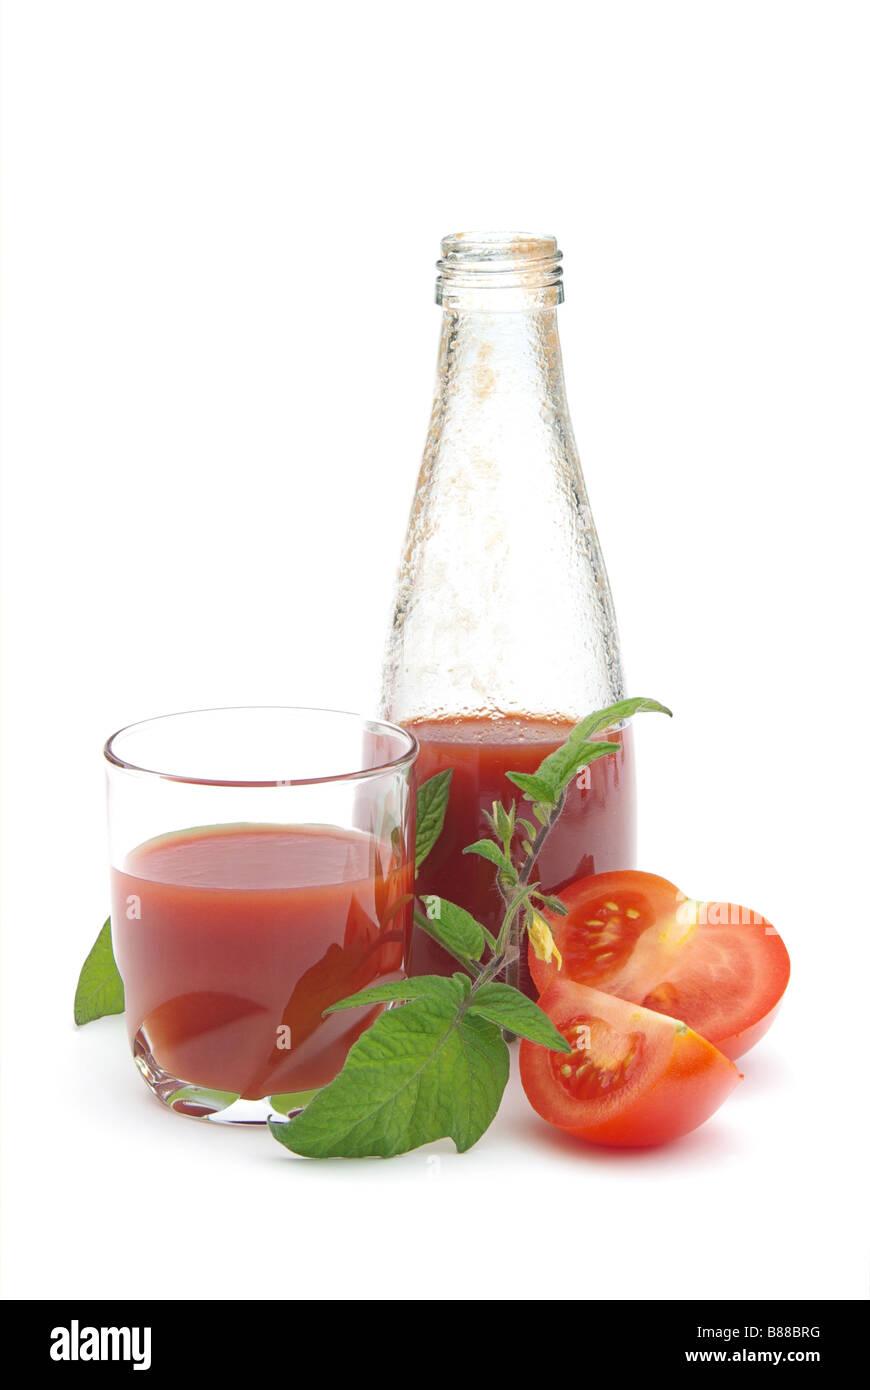 Tomatensaft tomato juice 01 - Stock Image